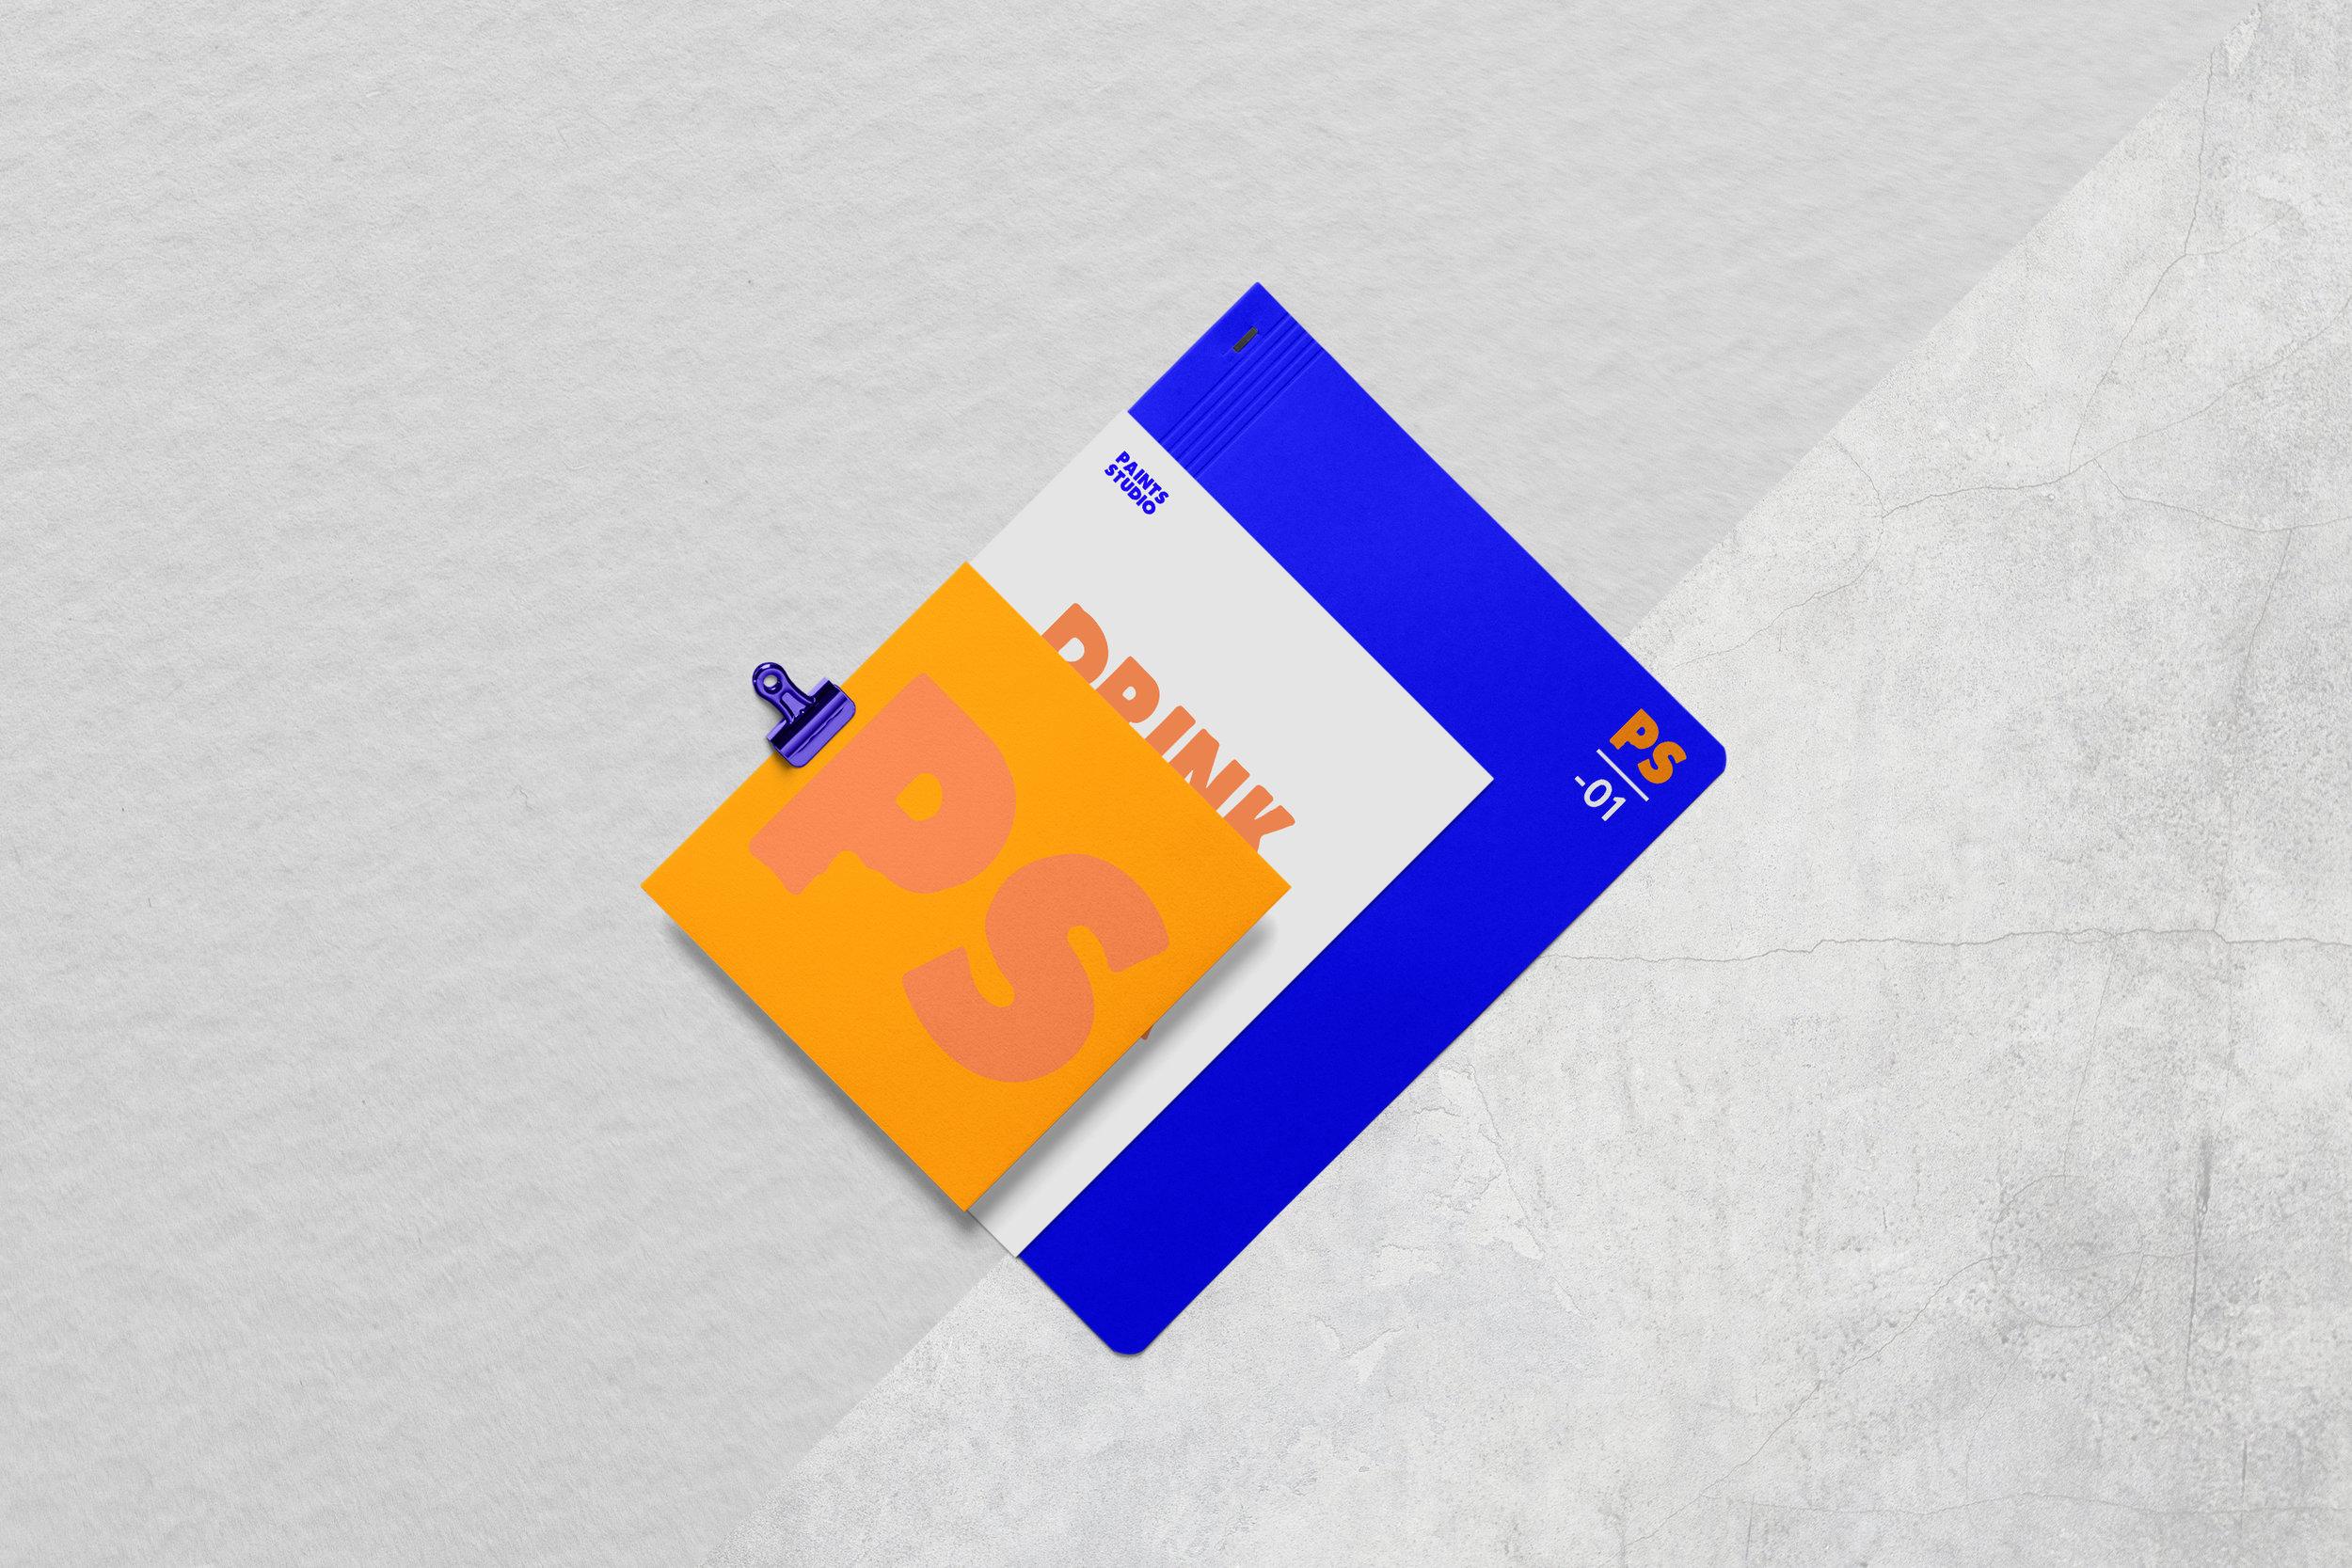 PS_WEB_Paints_Stationery.jpg